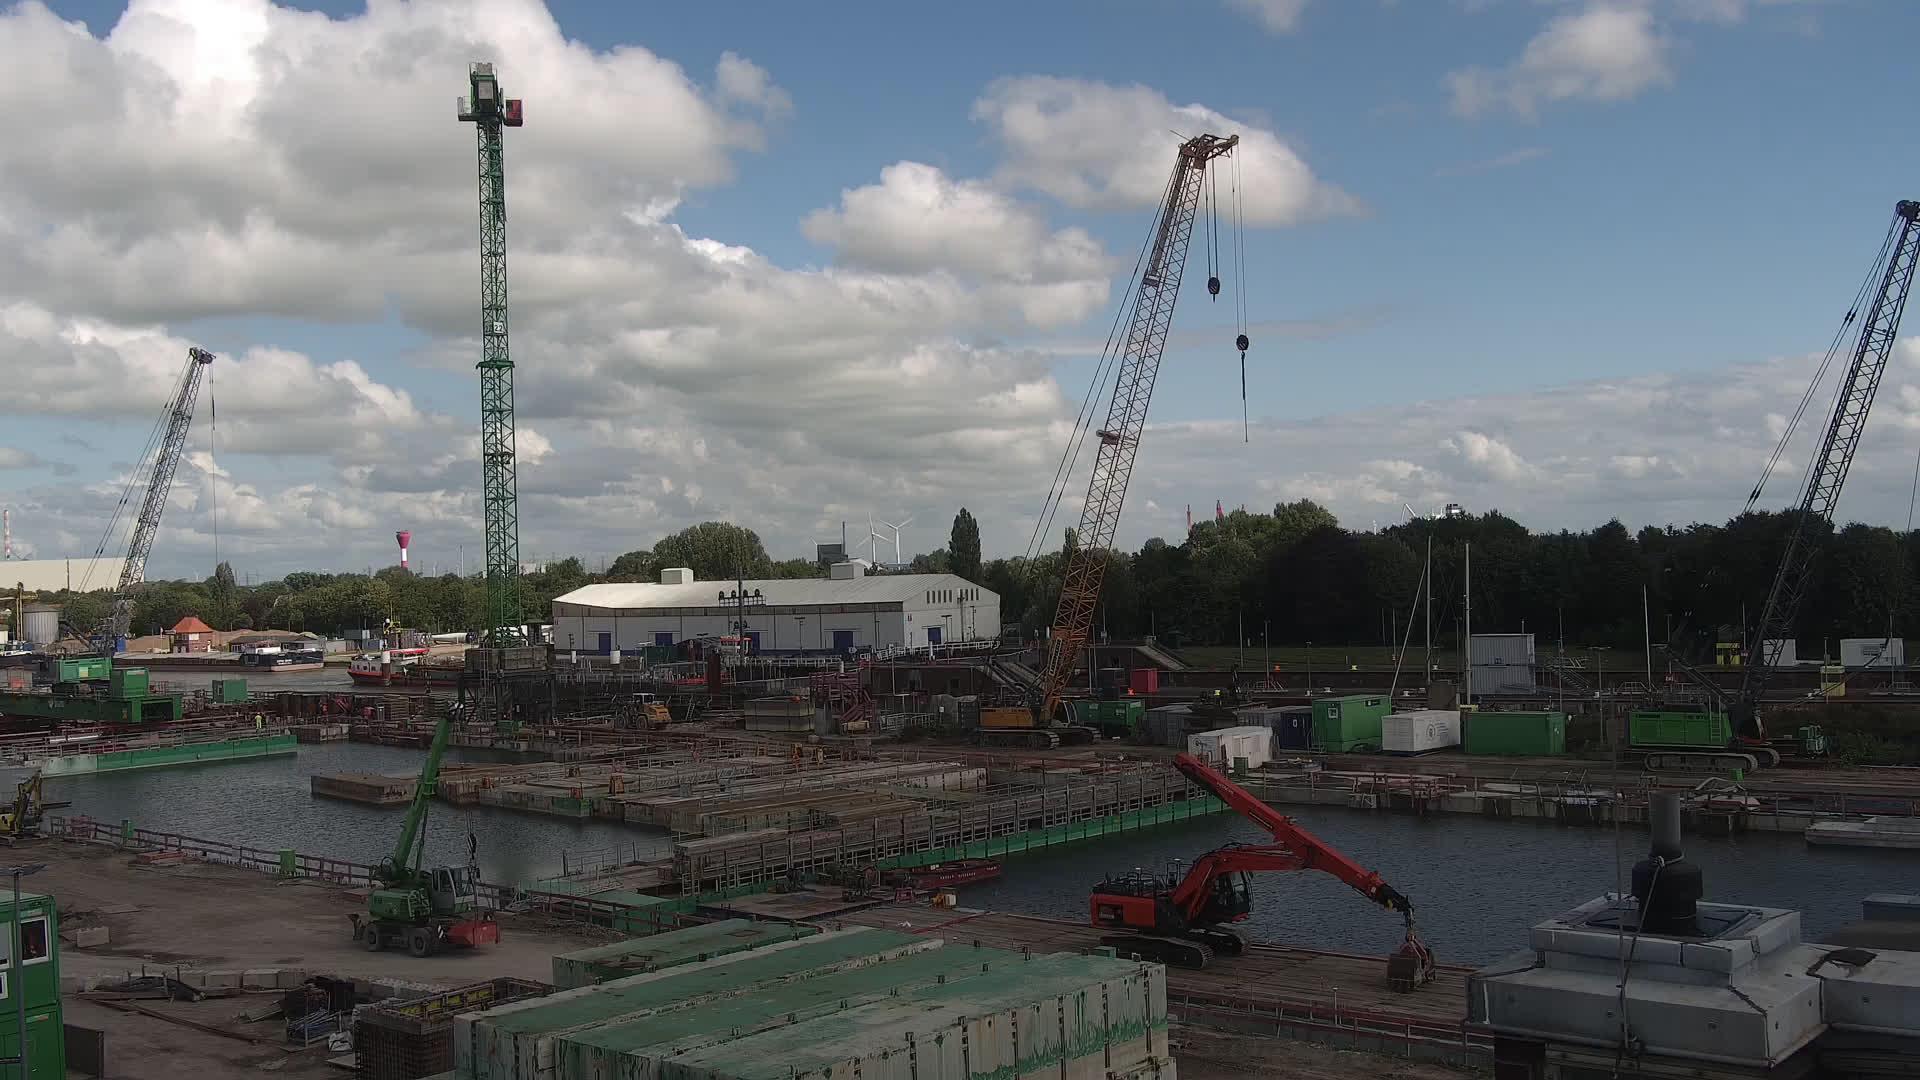 Schleuse Brunsbuttel: Livespotting - Webcam am Nord-Ostsee Kanal an der